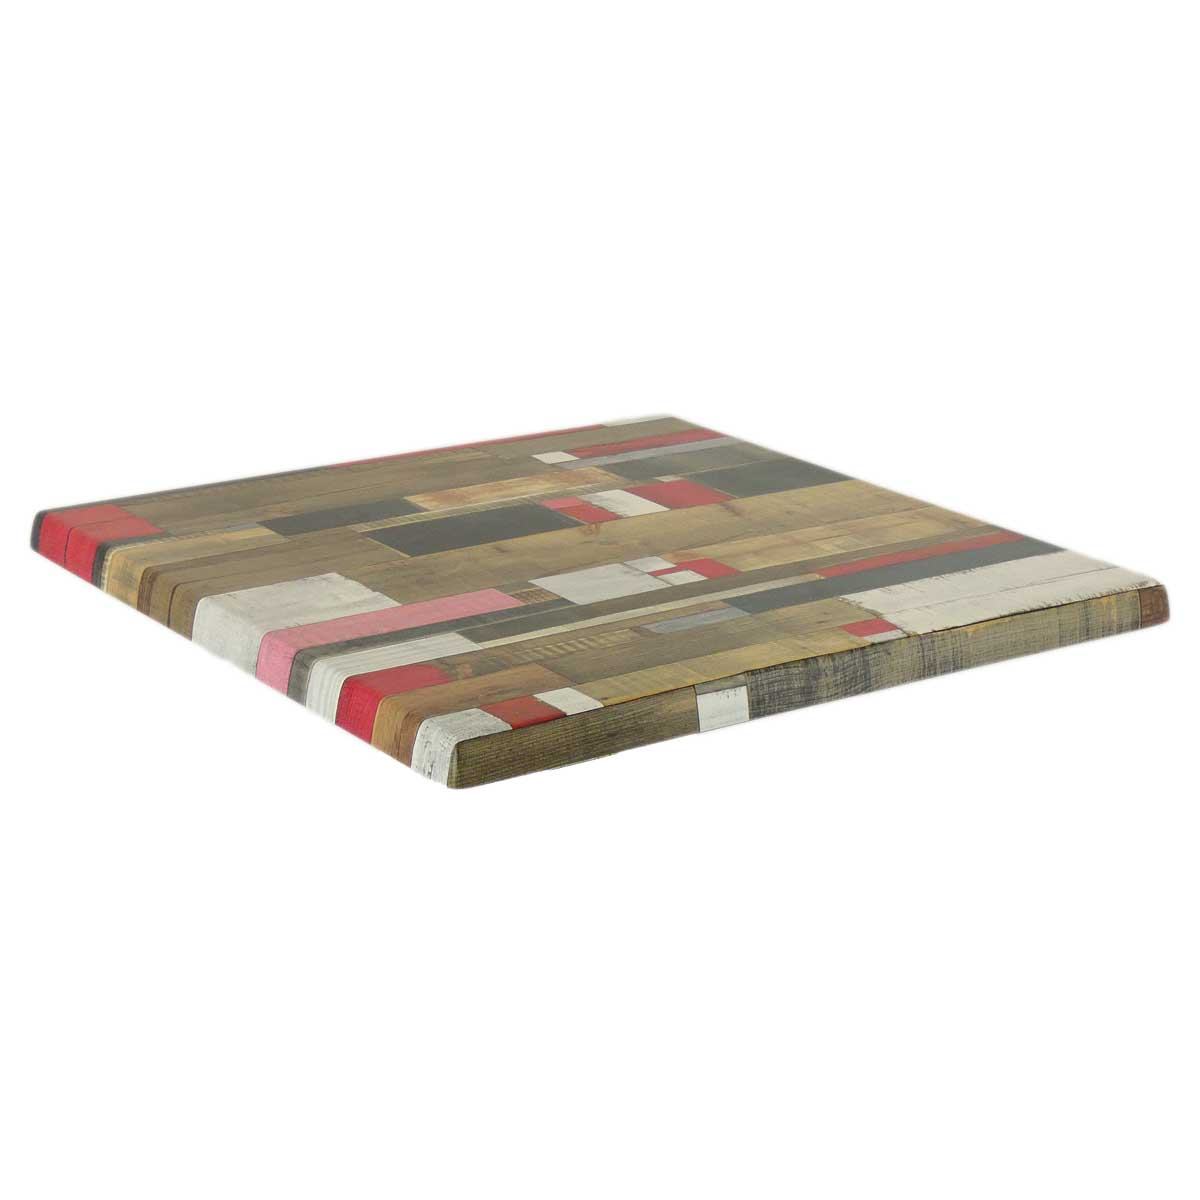 TICLA Q70 271 - https://www.werzalit.com/es/producto/tablero-de-la-mesa-classic-werzalit-q-80x80-271-kbana-rot/